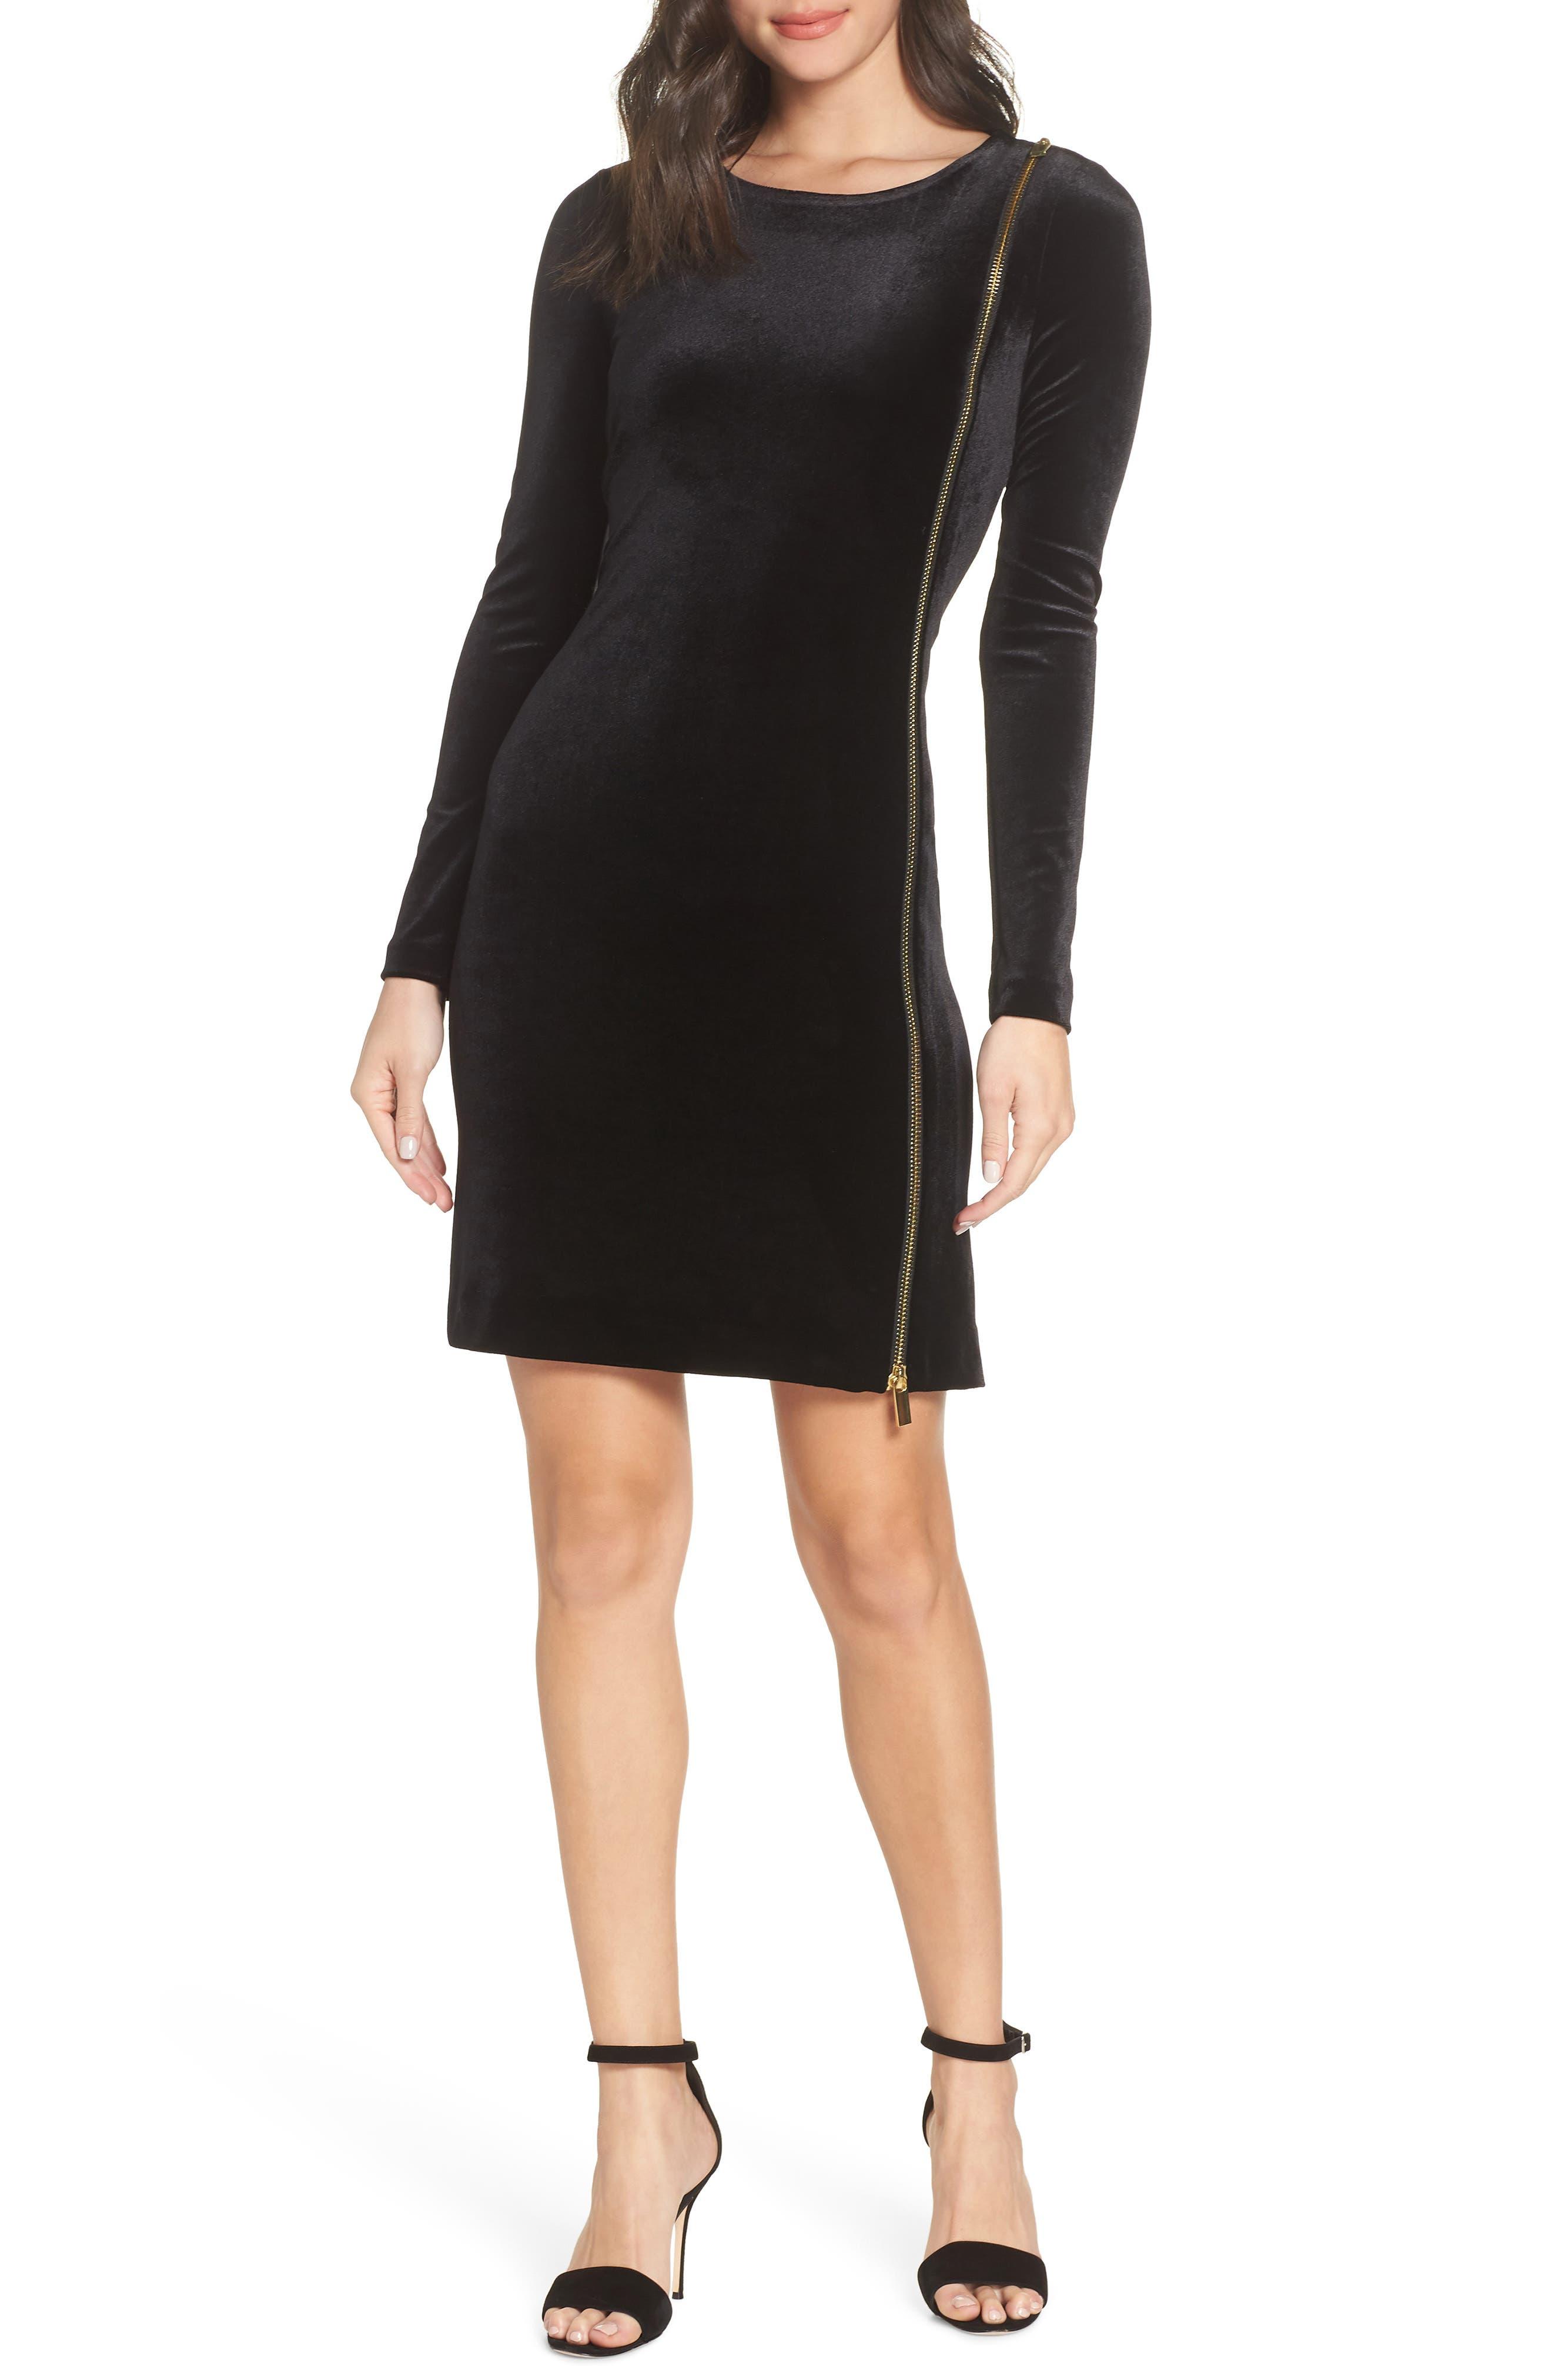 French Connection Zella Aurore Velvet Jersey Sheath Dress, Black